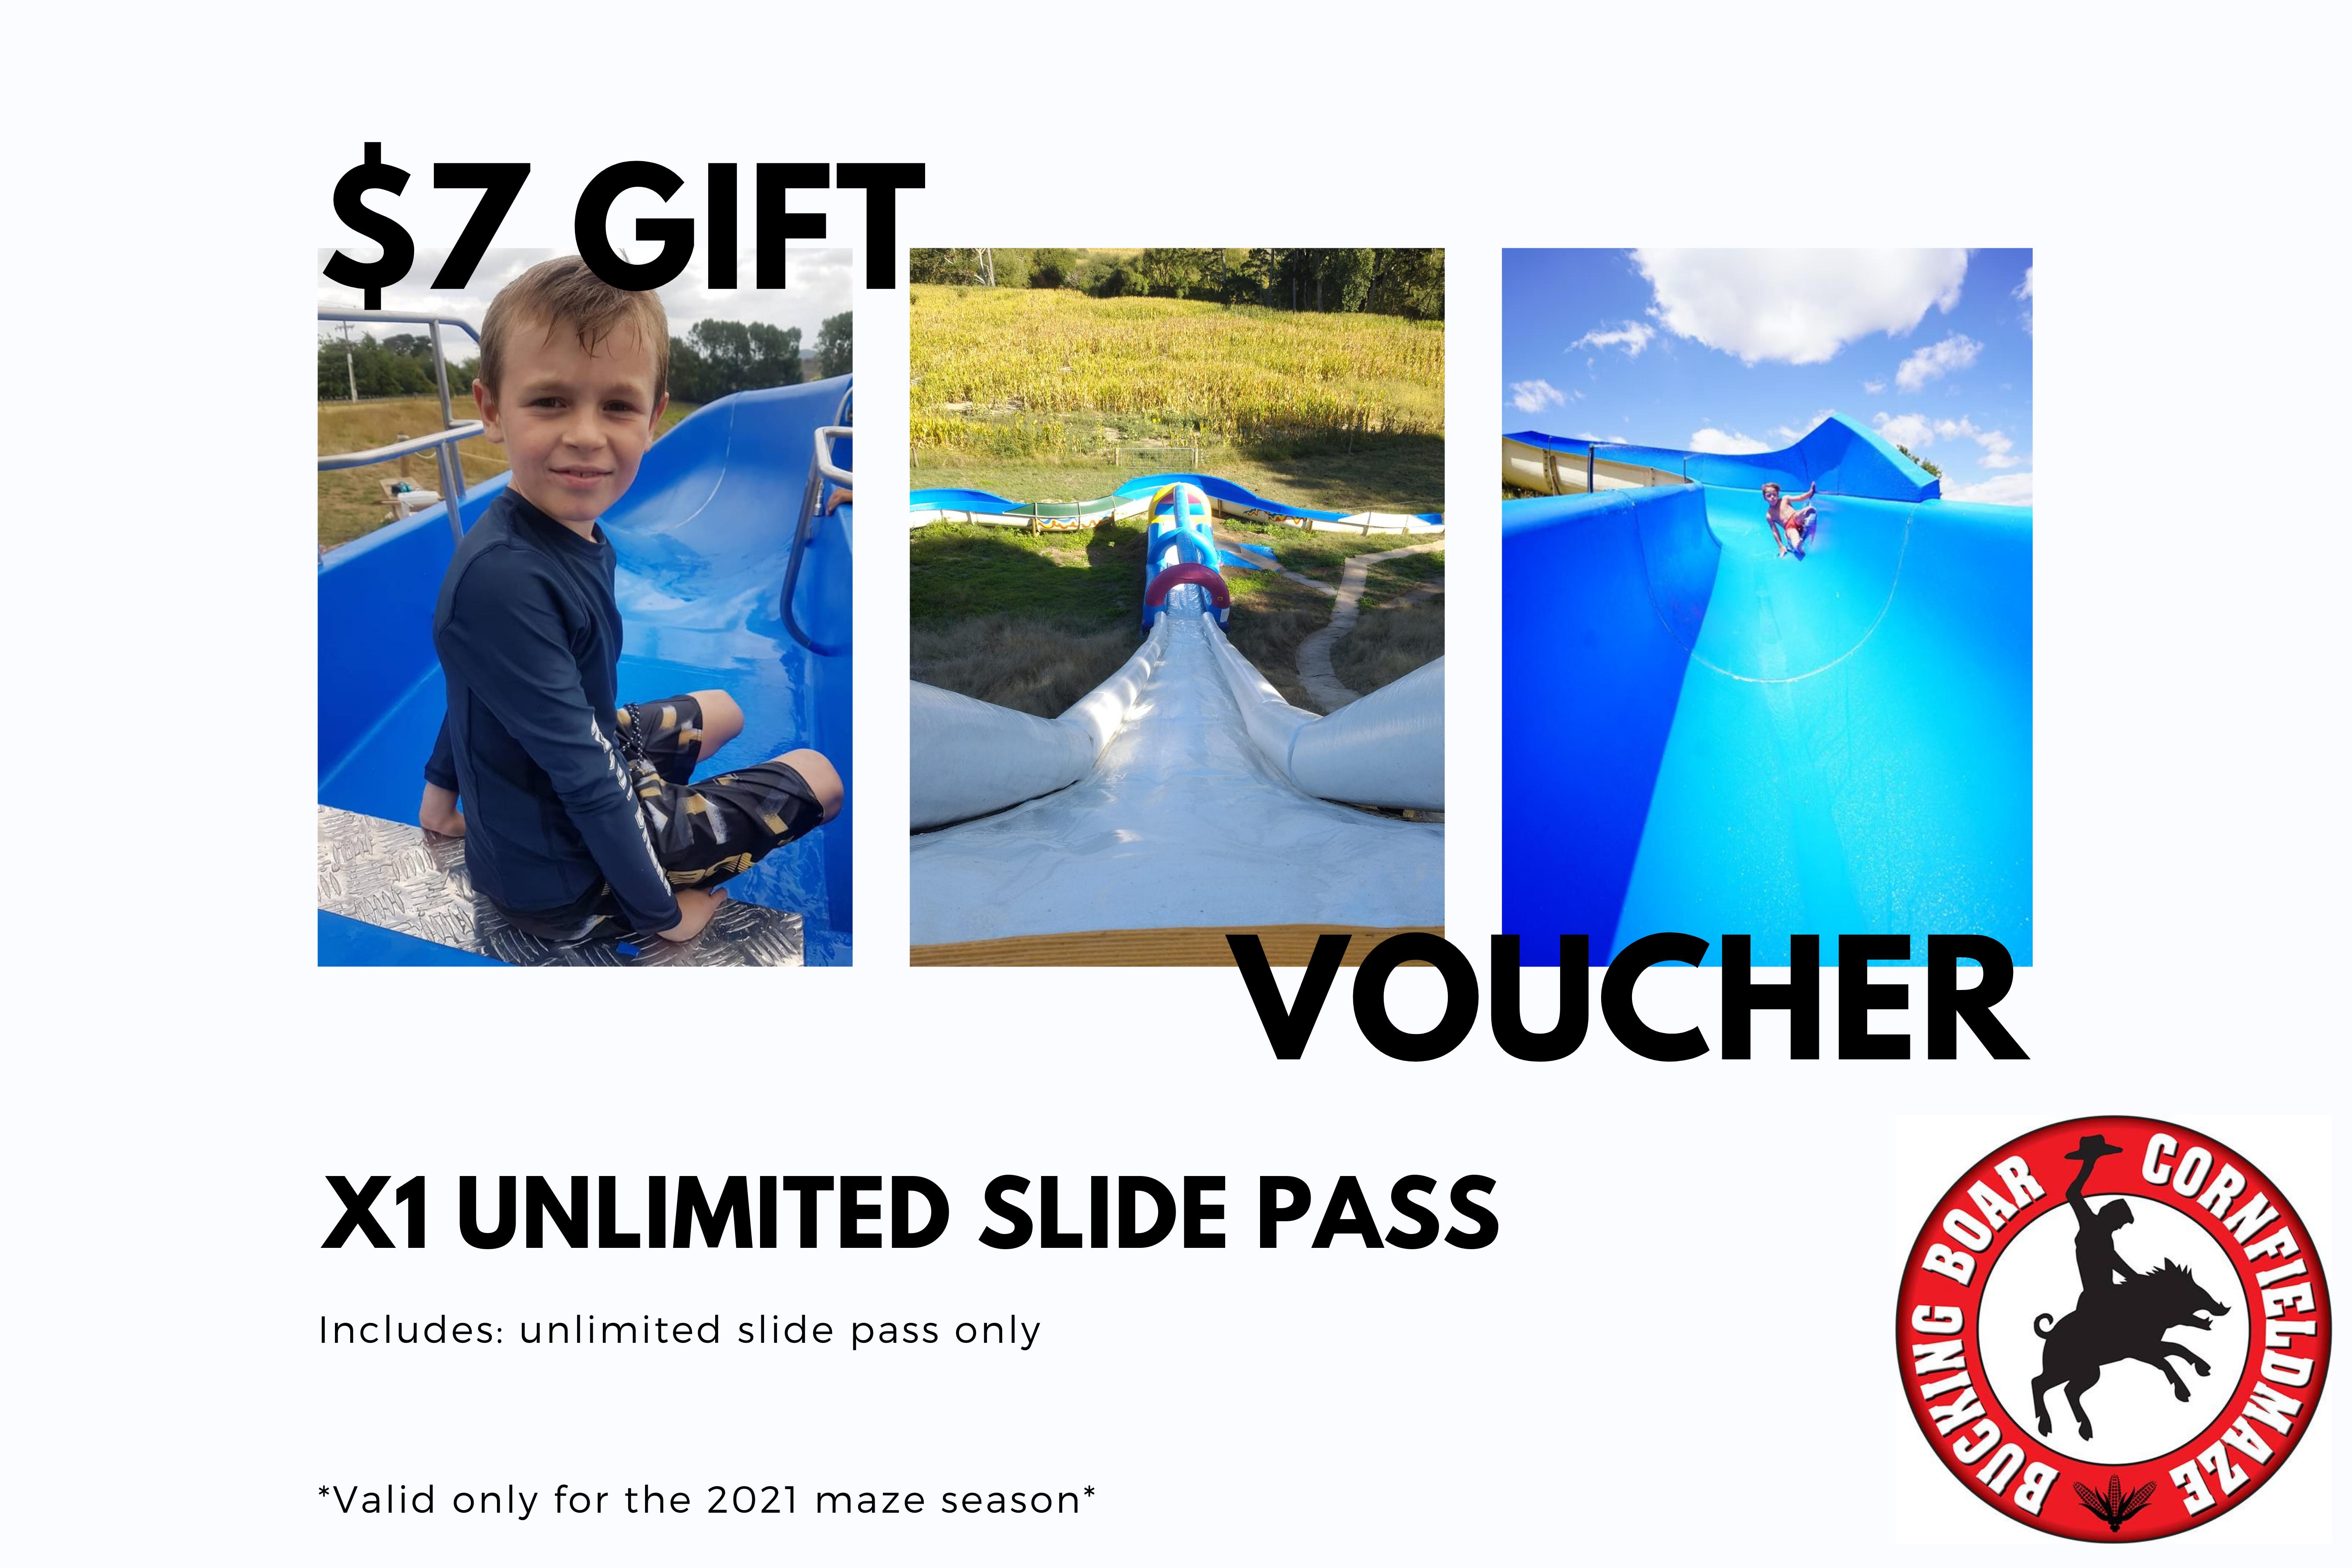 Gift Voucher - Unlimited Slide Pass